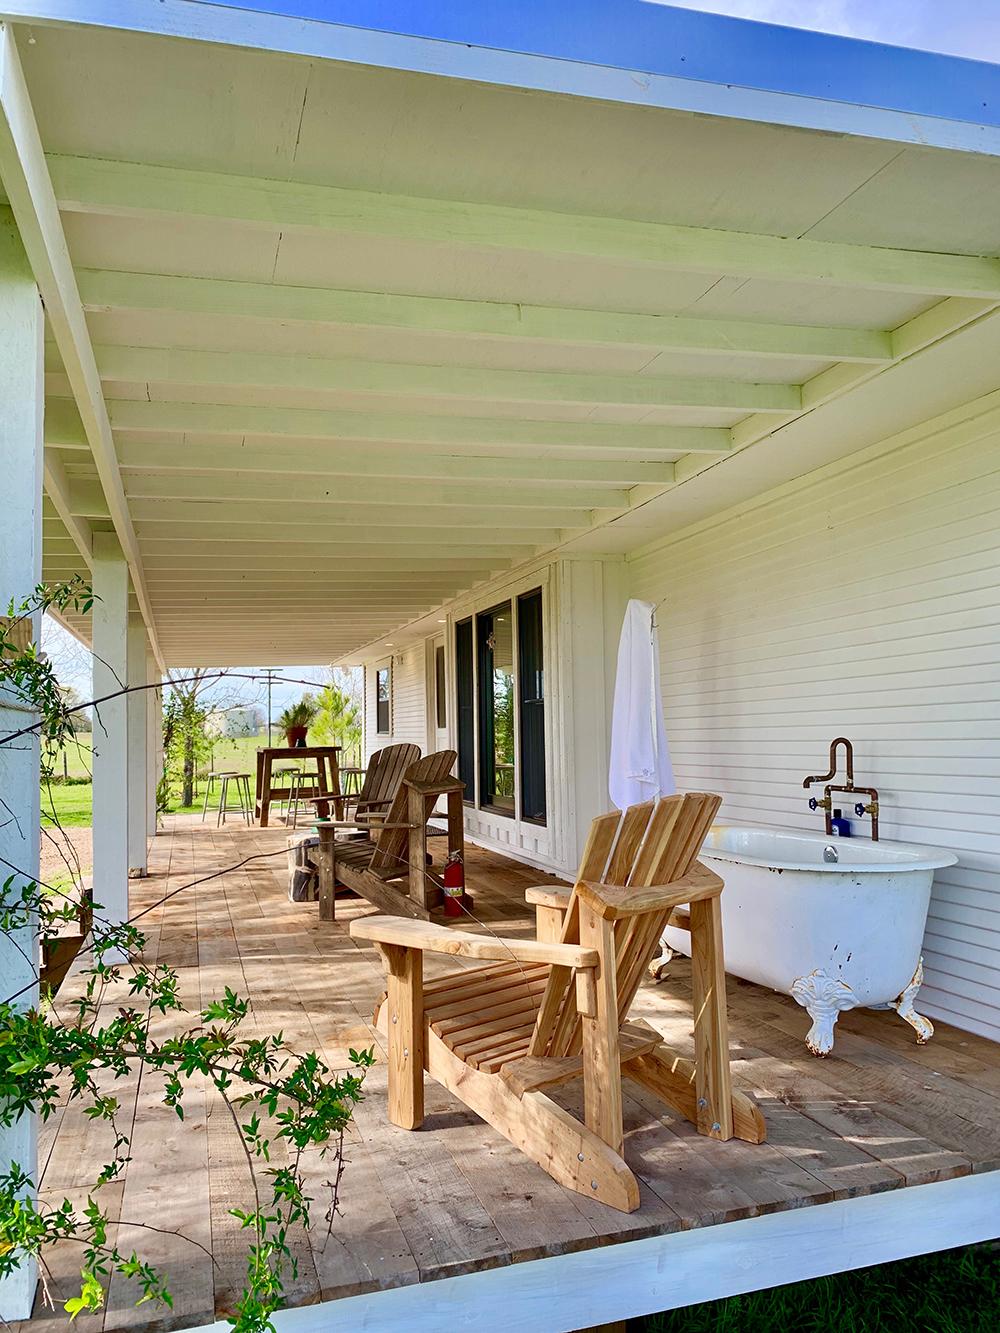 farmouze back porch4.JPG